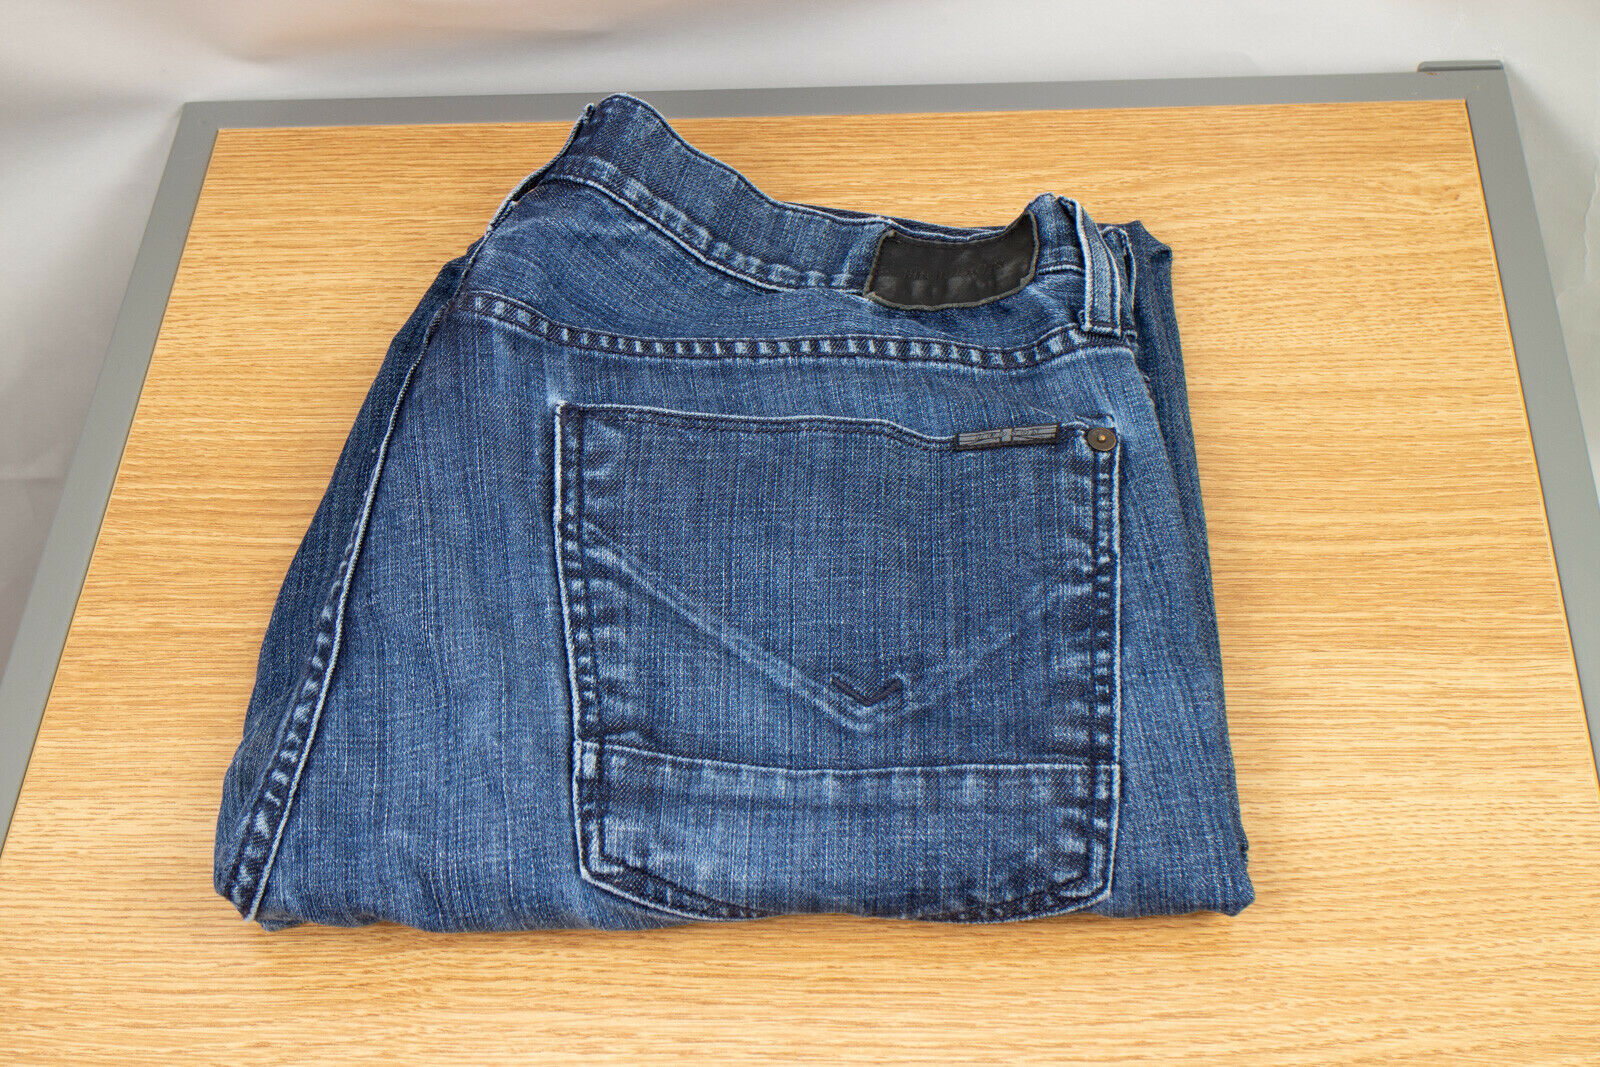 Hudson Men's Denim Jeans 36 Byron Straight Medium Wash Button Fly Measure 34 30